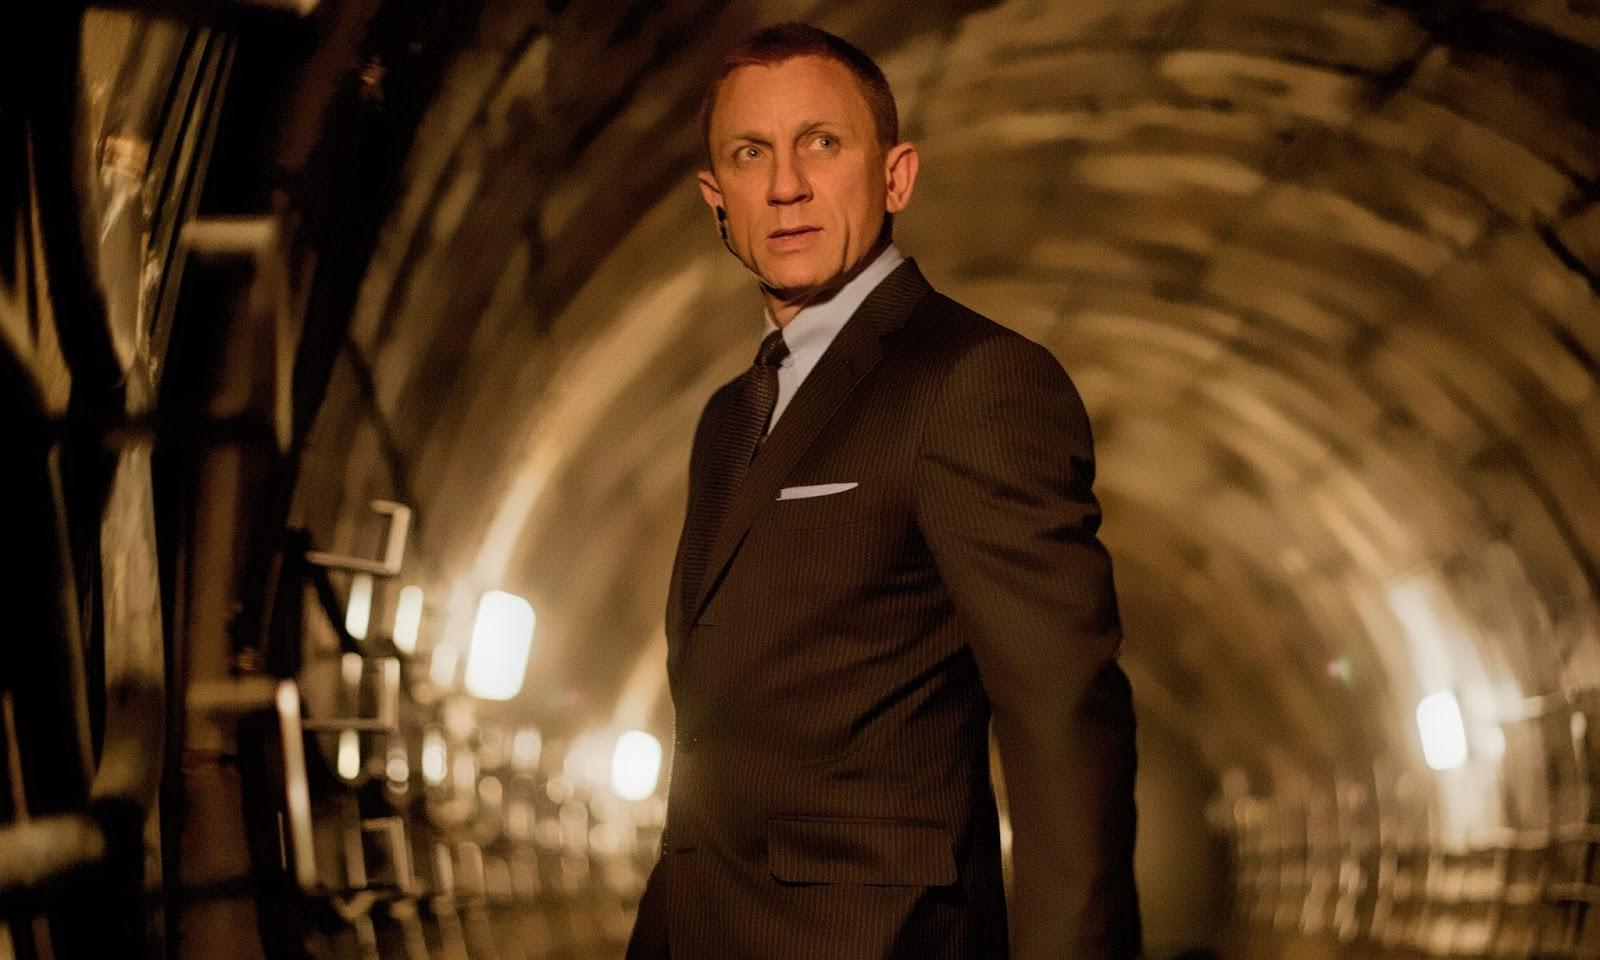 James Bond Spectre Streaming